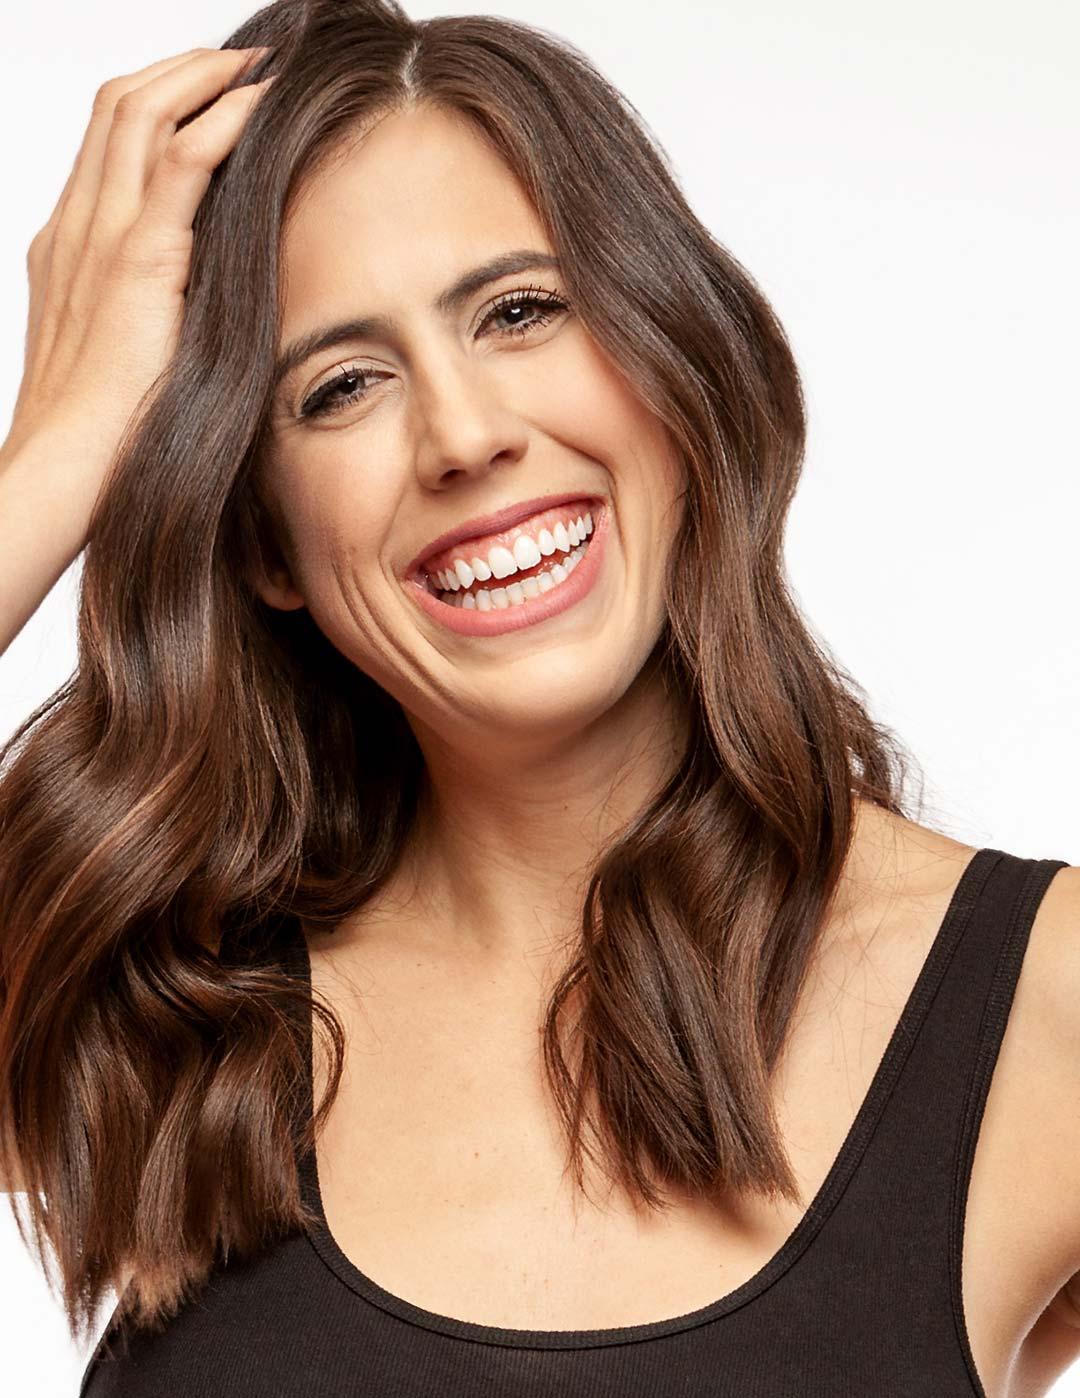 julie shot for models & images wichita kansas test shoot